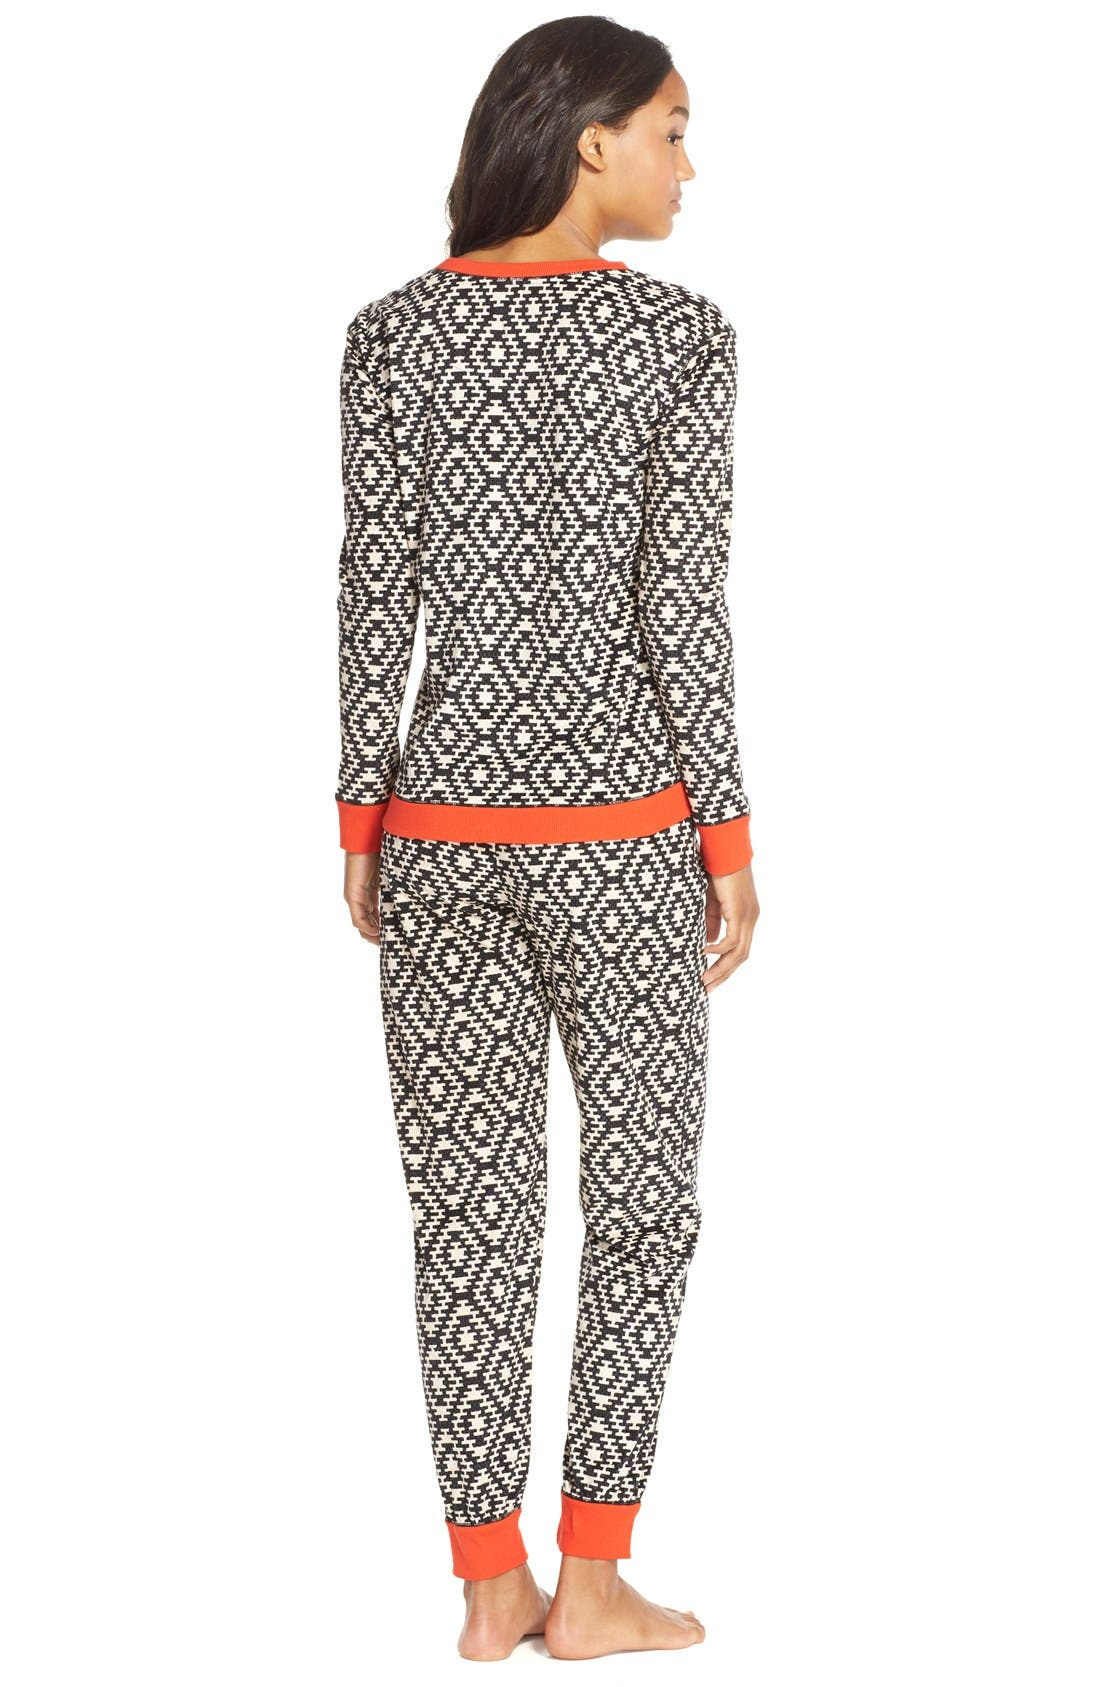 KENSIE,                             'ArcticChill' Knit Pajamas,                             Alternate thumbnail 2, color,                             015